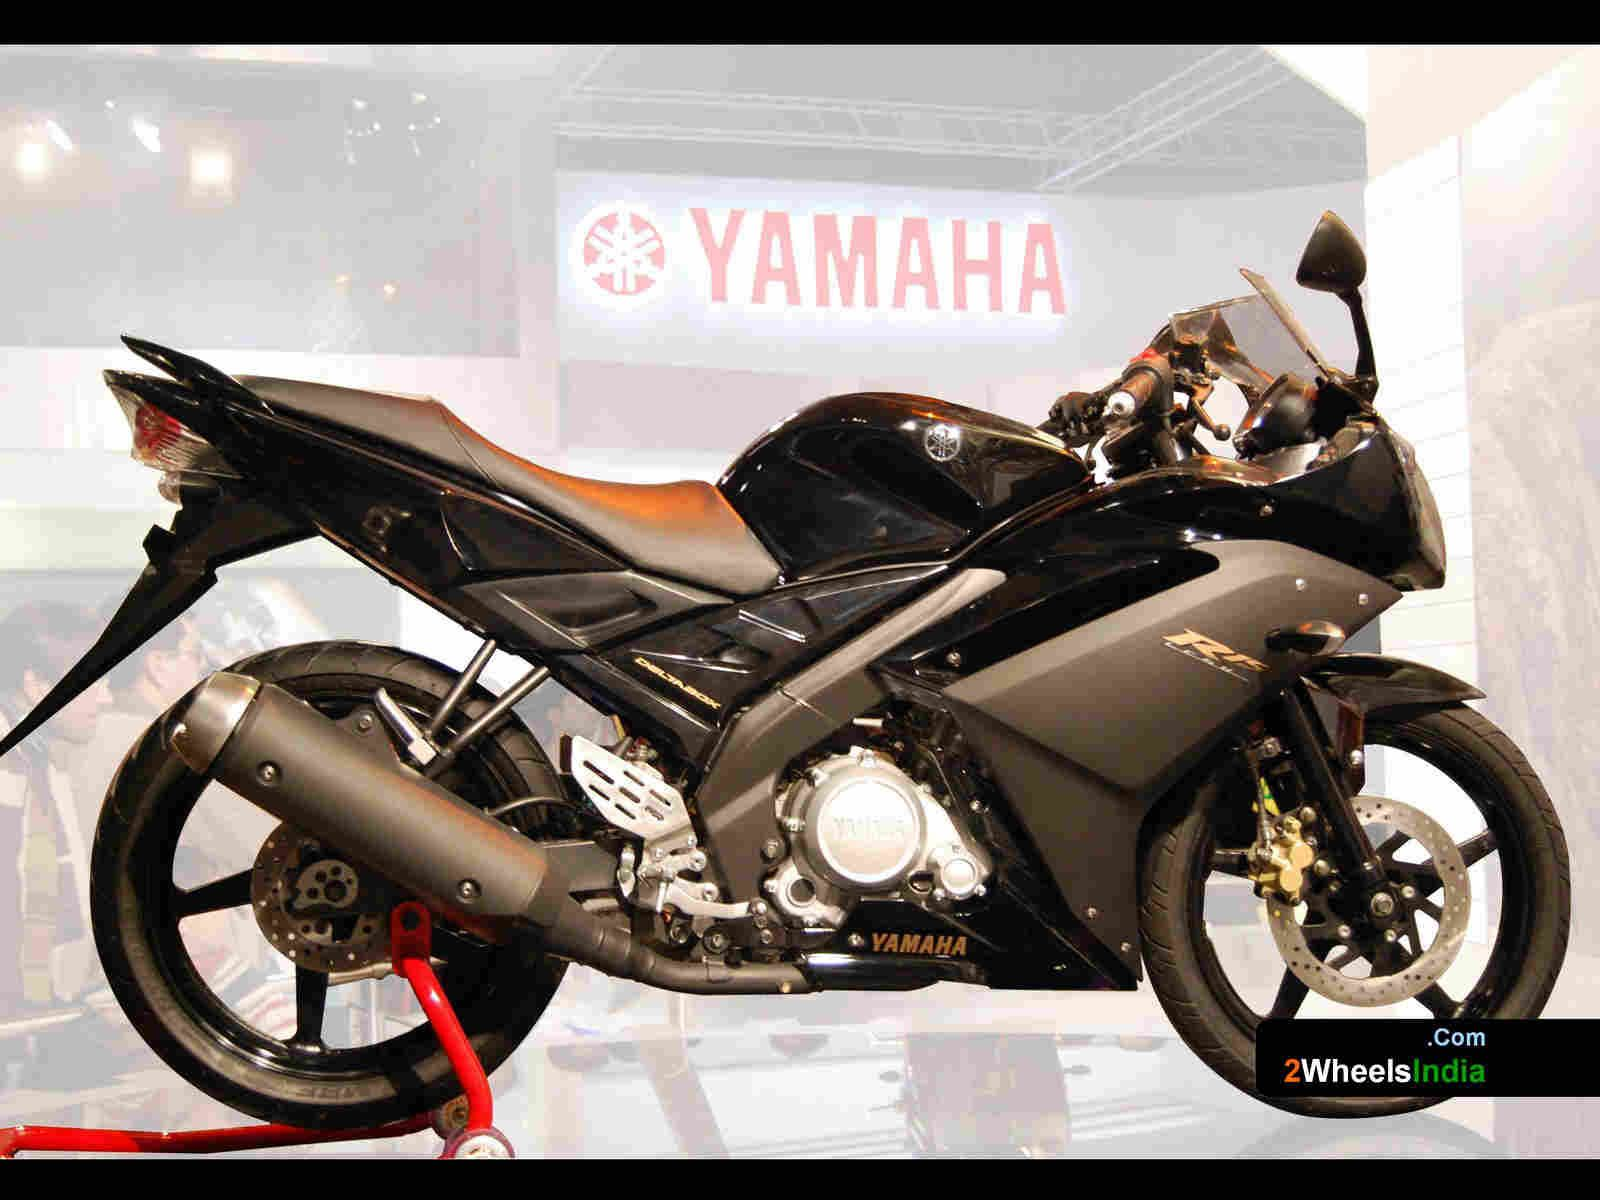 New Yamaha Bikes Launching In India Yamaha Bikes Bike Yamaha